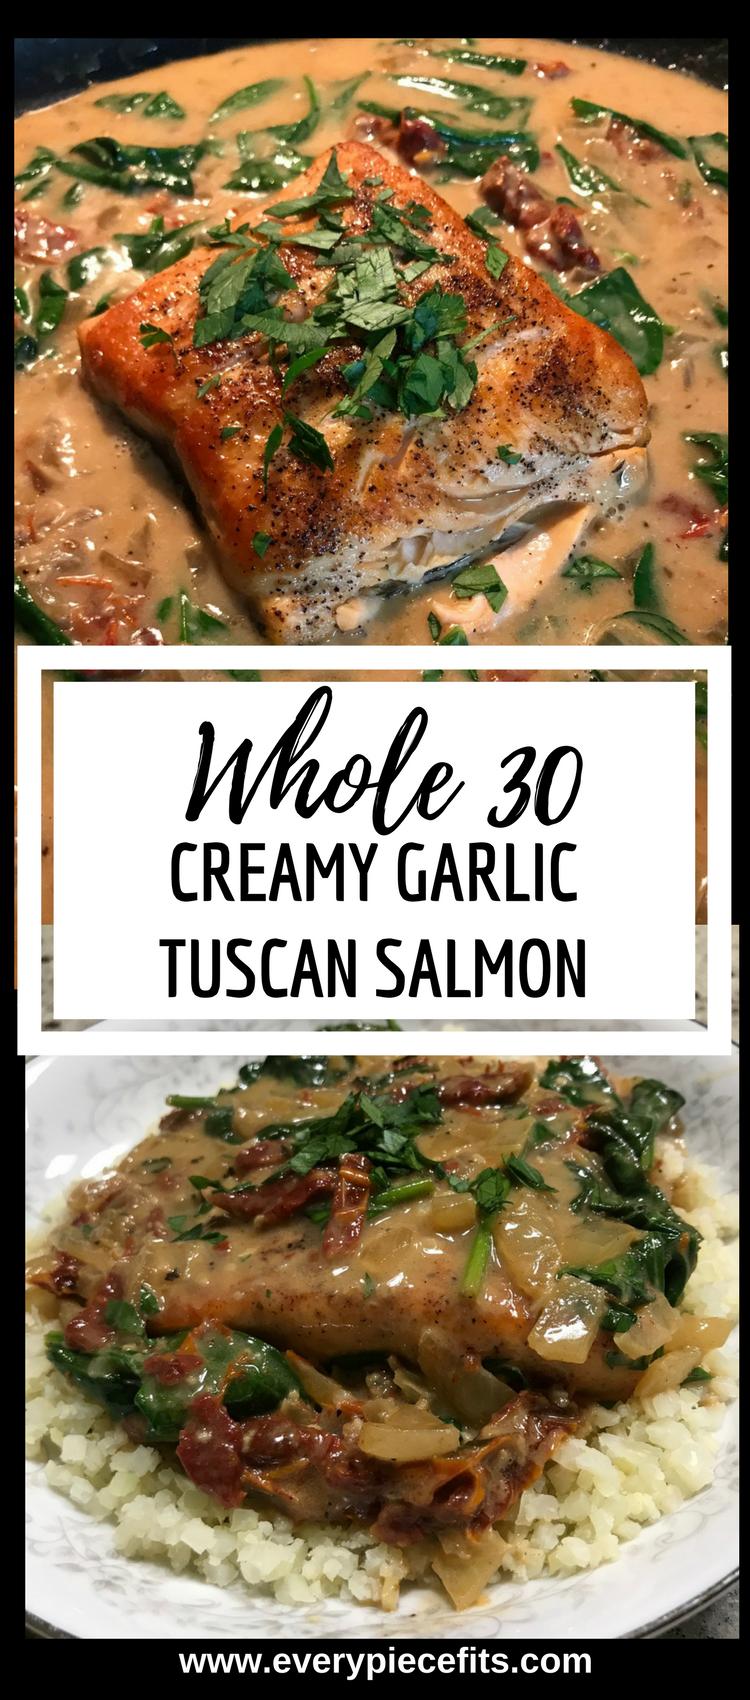 Whole 30 & Paleo Creamy Garlic Tuscan Salmon.png